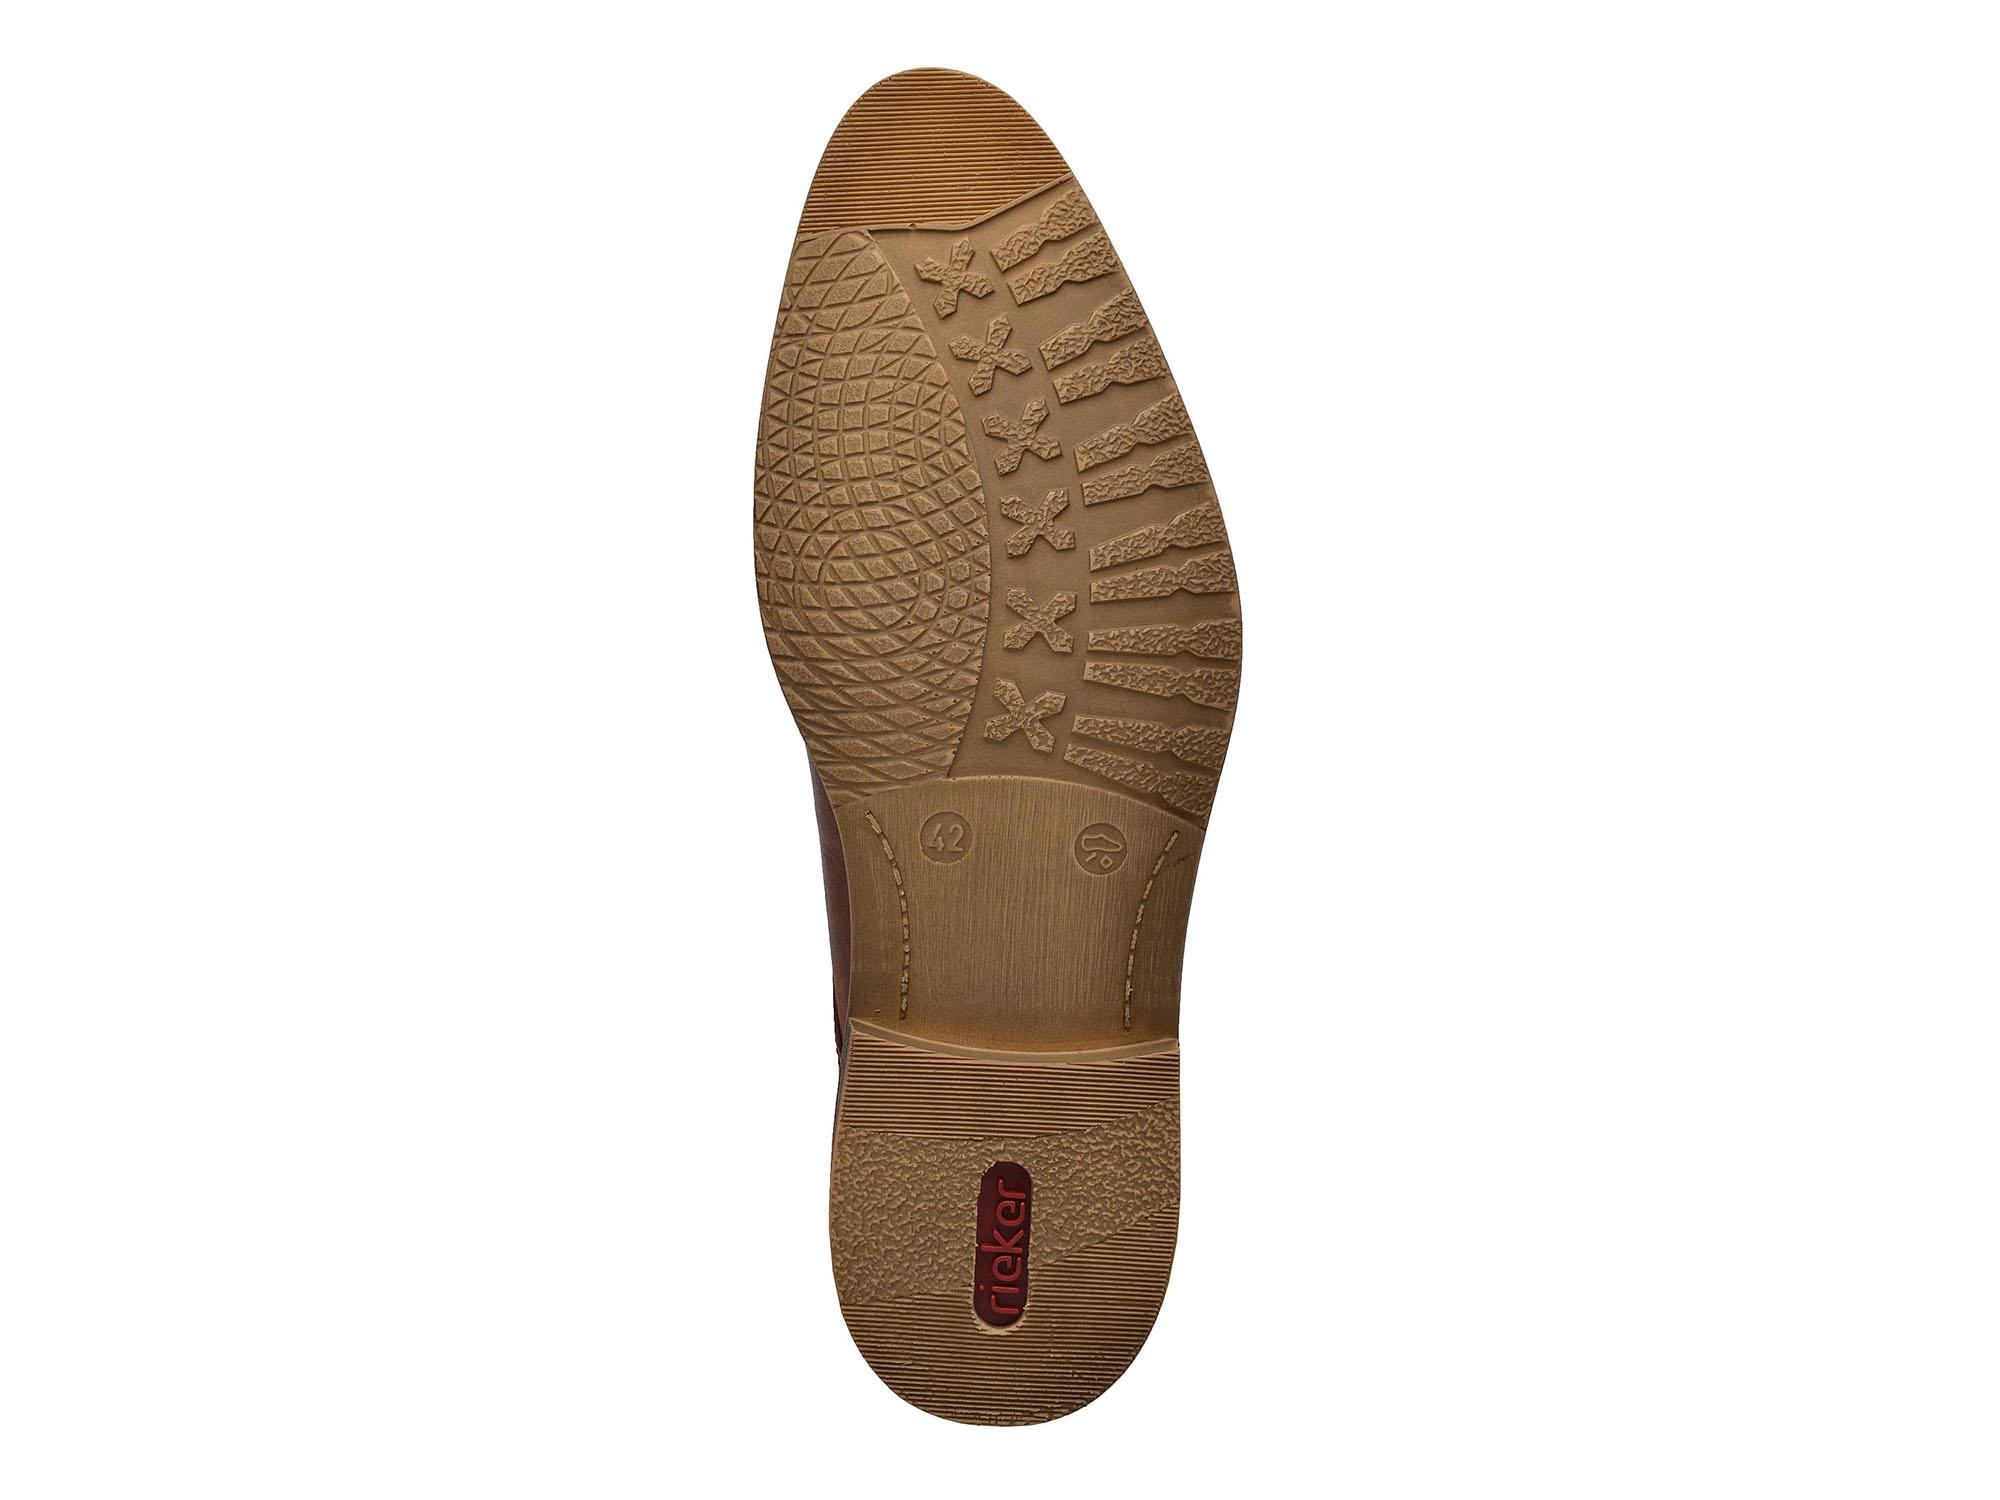 detail Pánská obuv RIEKER br 11403 25 BRAUN KOMBI F S 8 5a3dedd6780